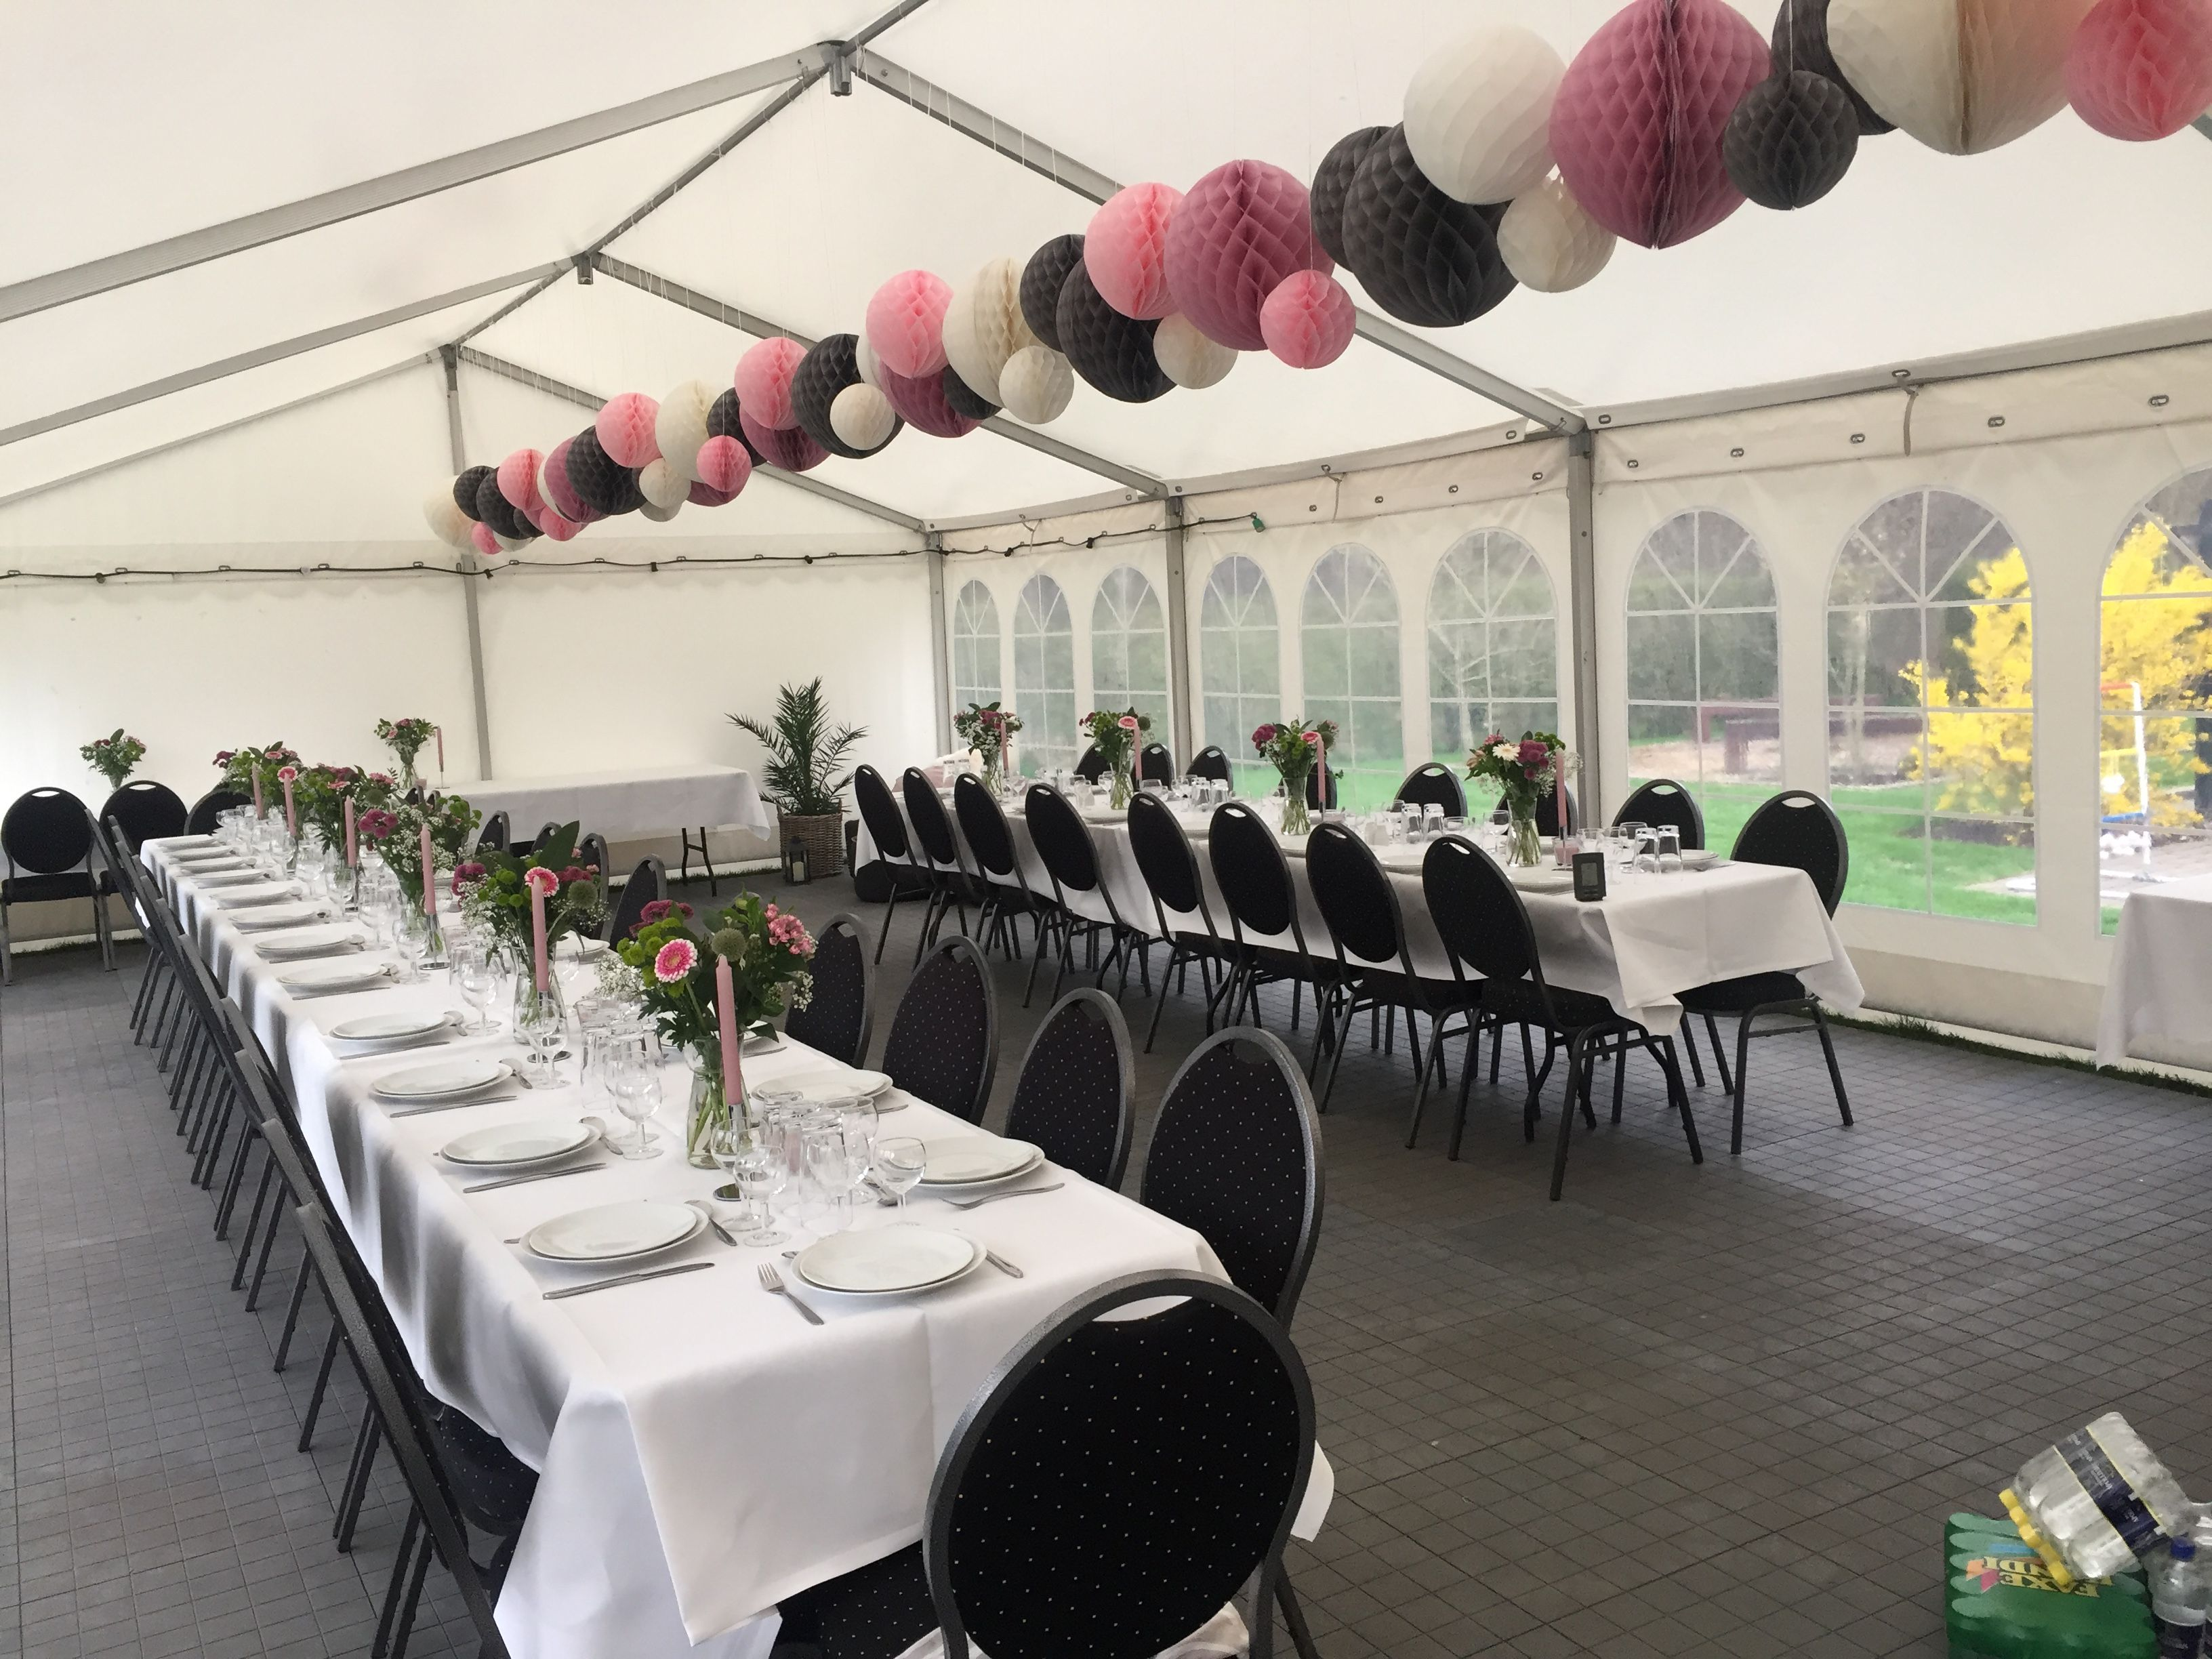 Konfirmation I Telt Bord Dekorationer Bryllup Baghave Bryllup